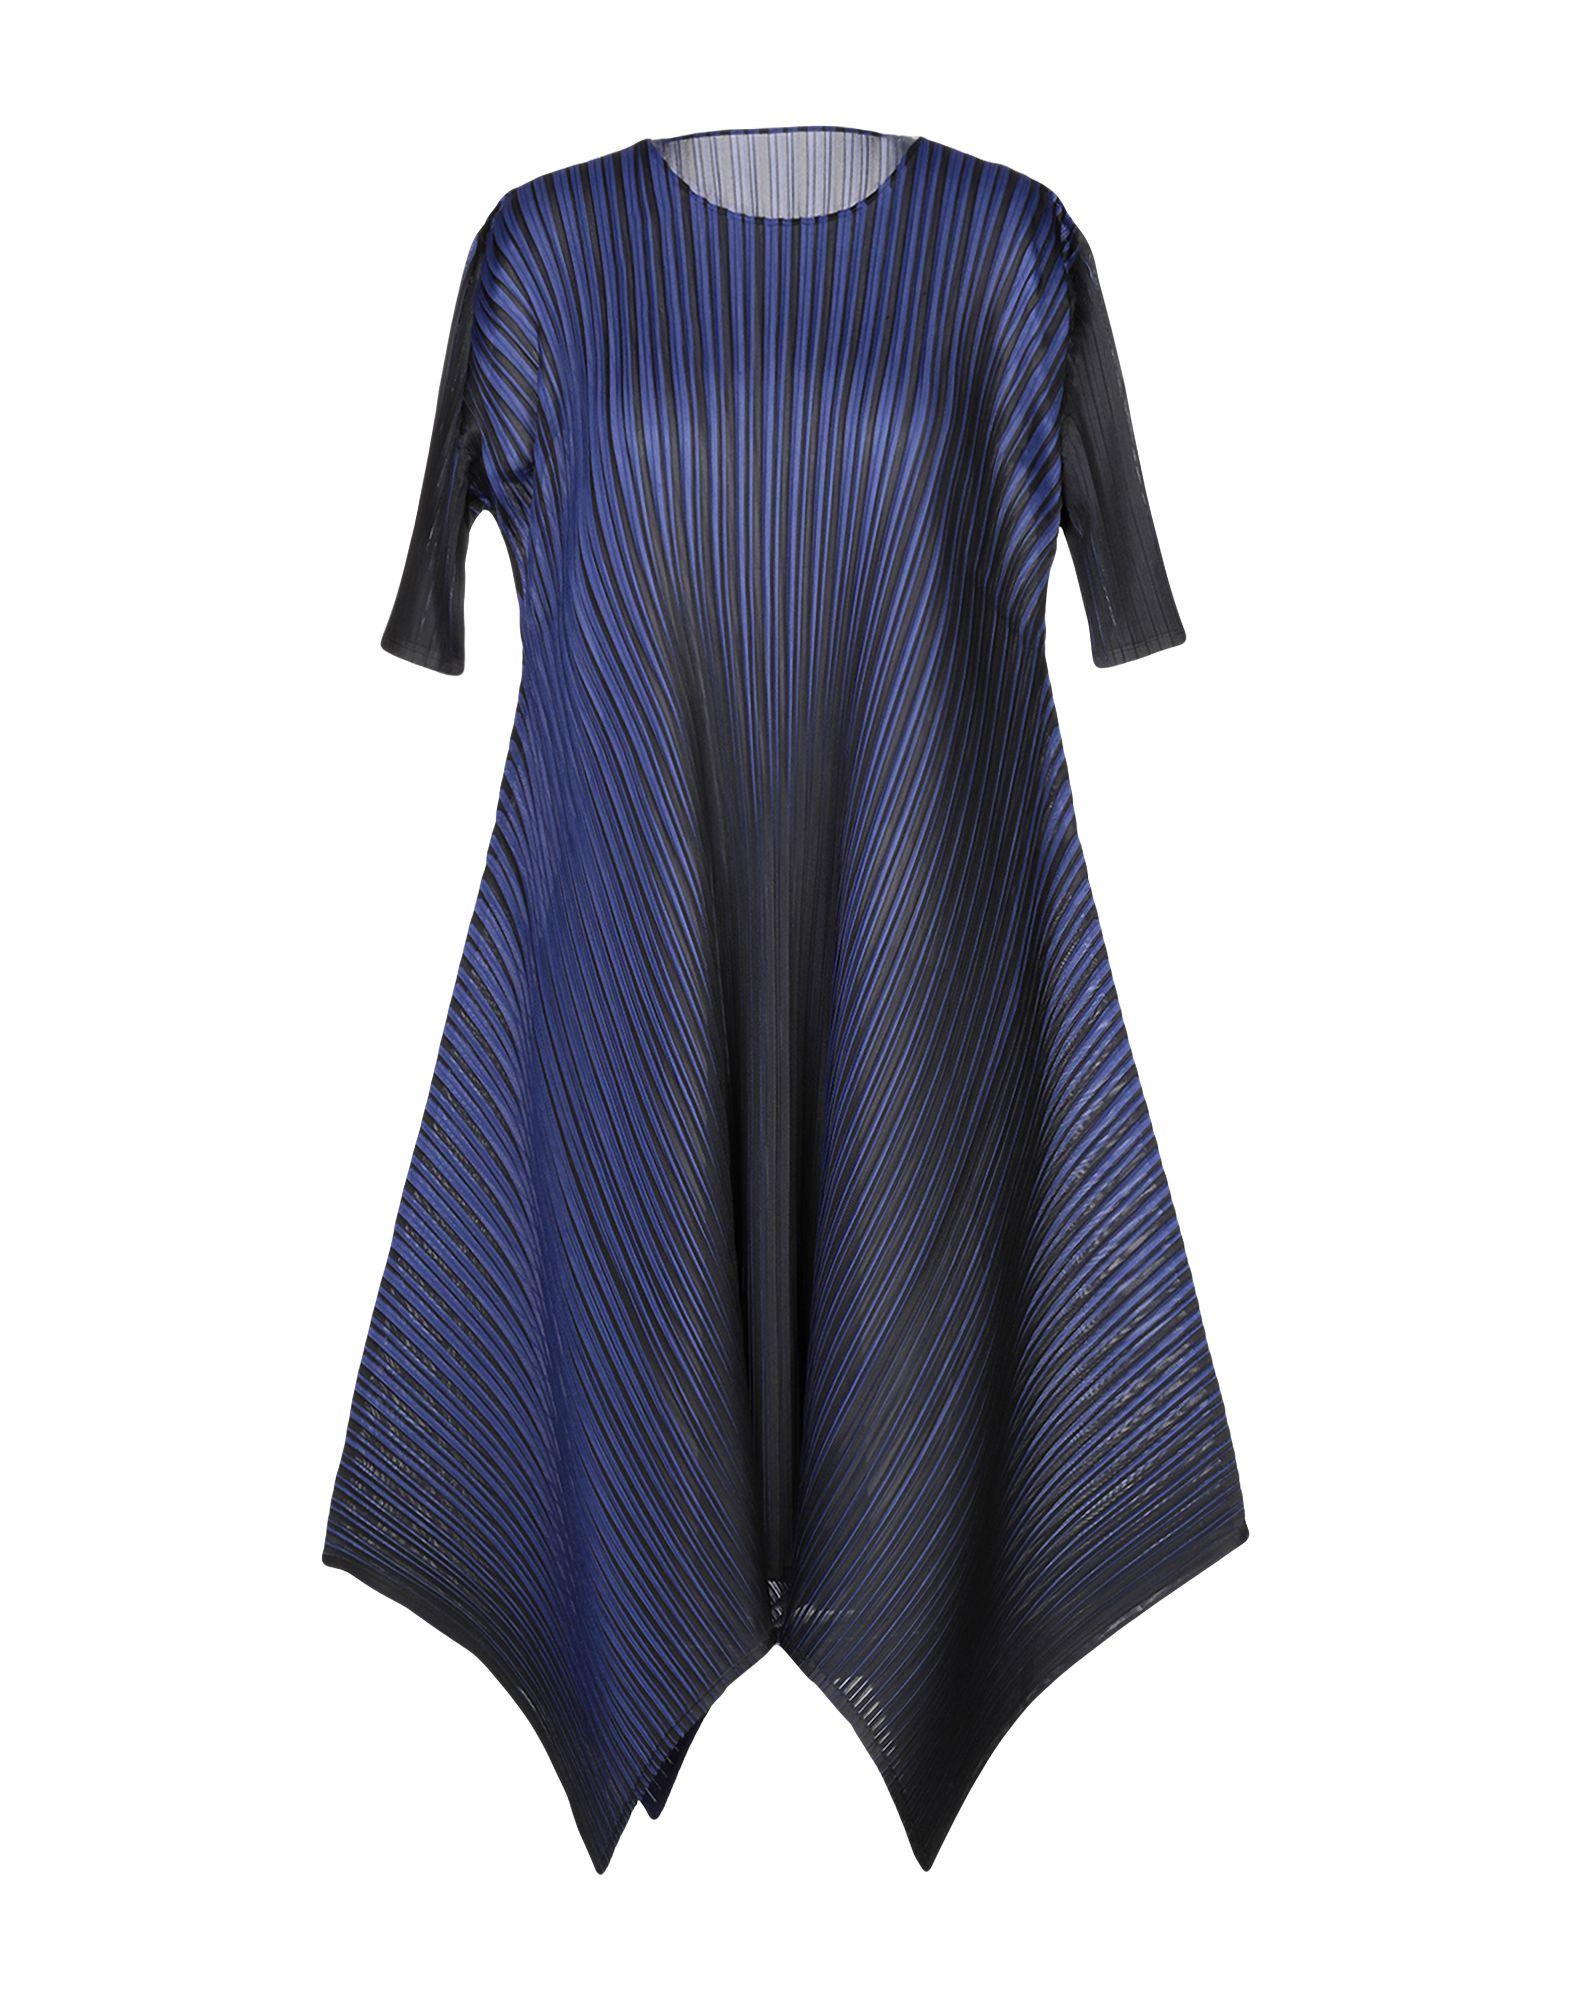 Vestito Corto Pleats Please Issey Miyake damen - 34951215KP